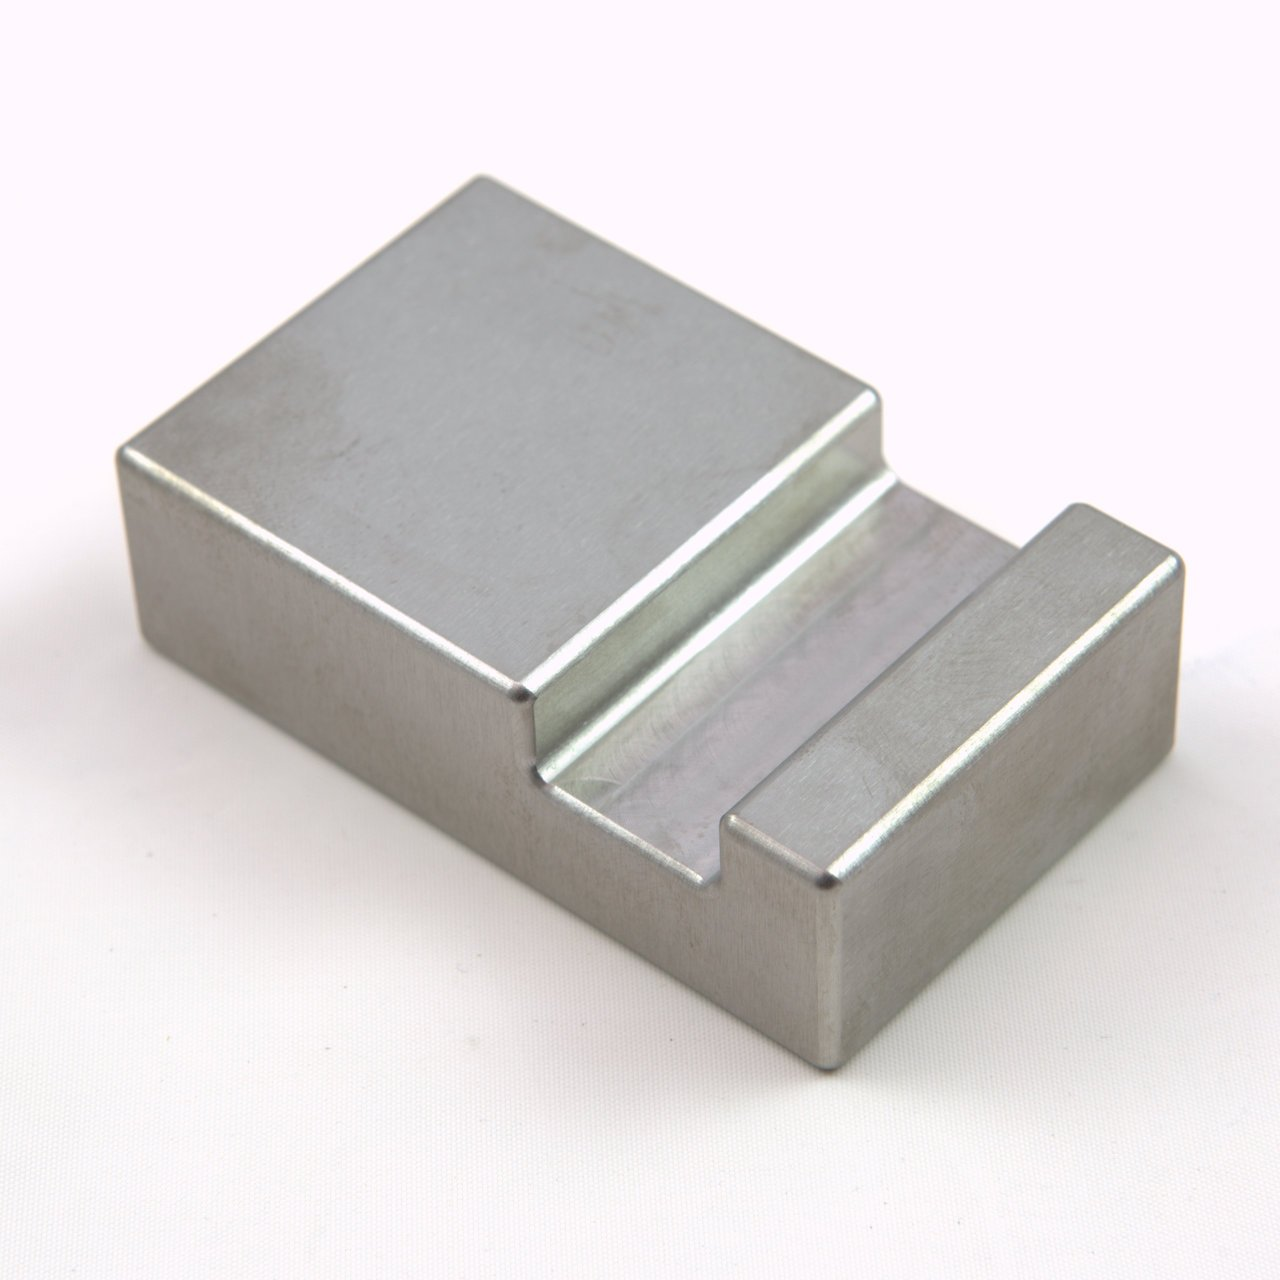 Tungsten Ergonomic Bucking Bar BB-5: 1.67 lbs, Notched Side 3/4'' x 1.5'' x 2.5''